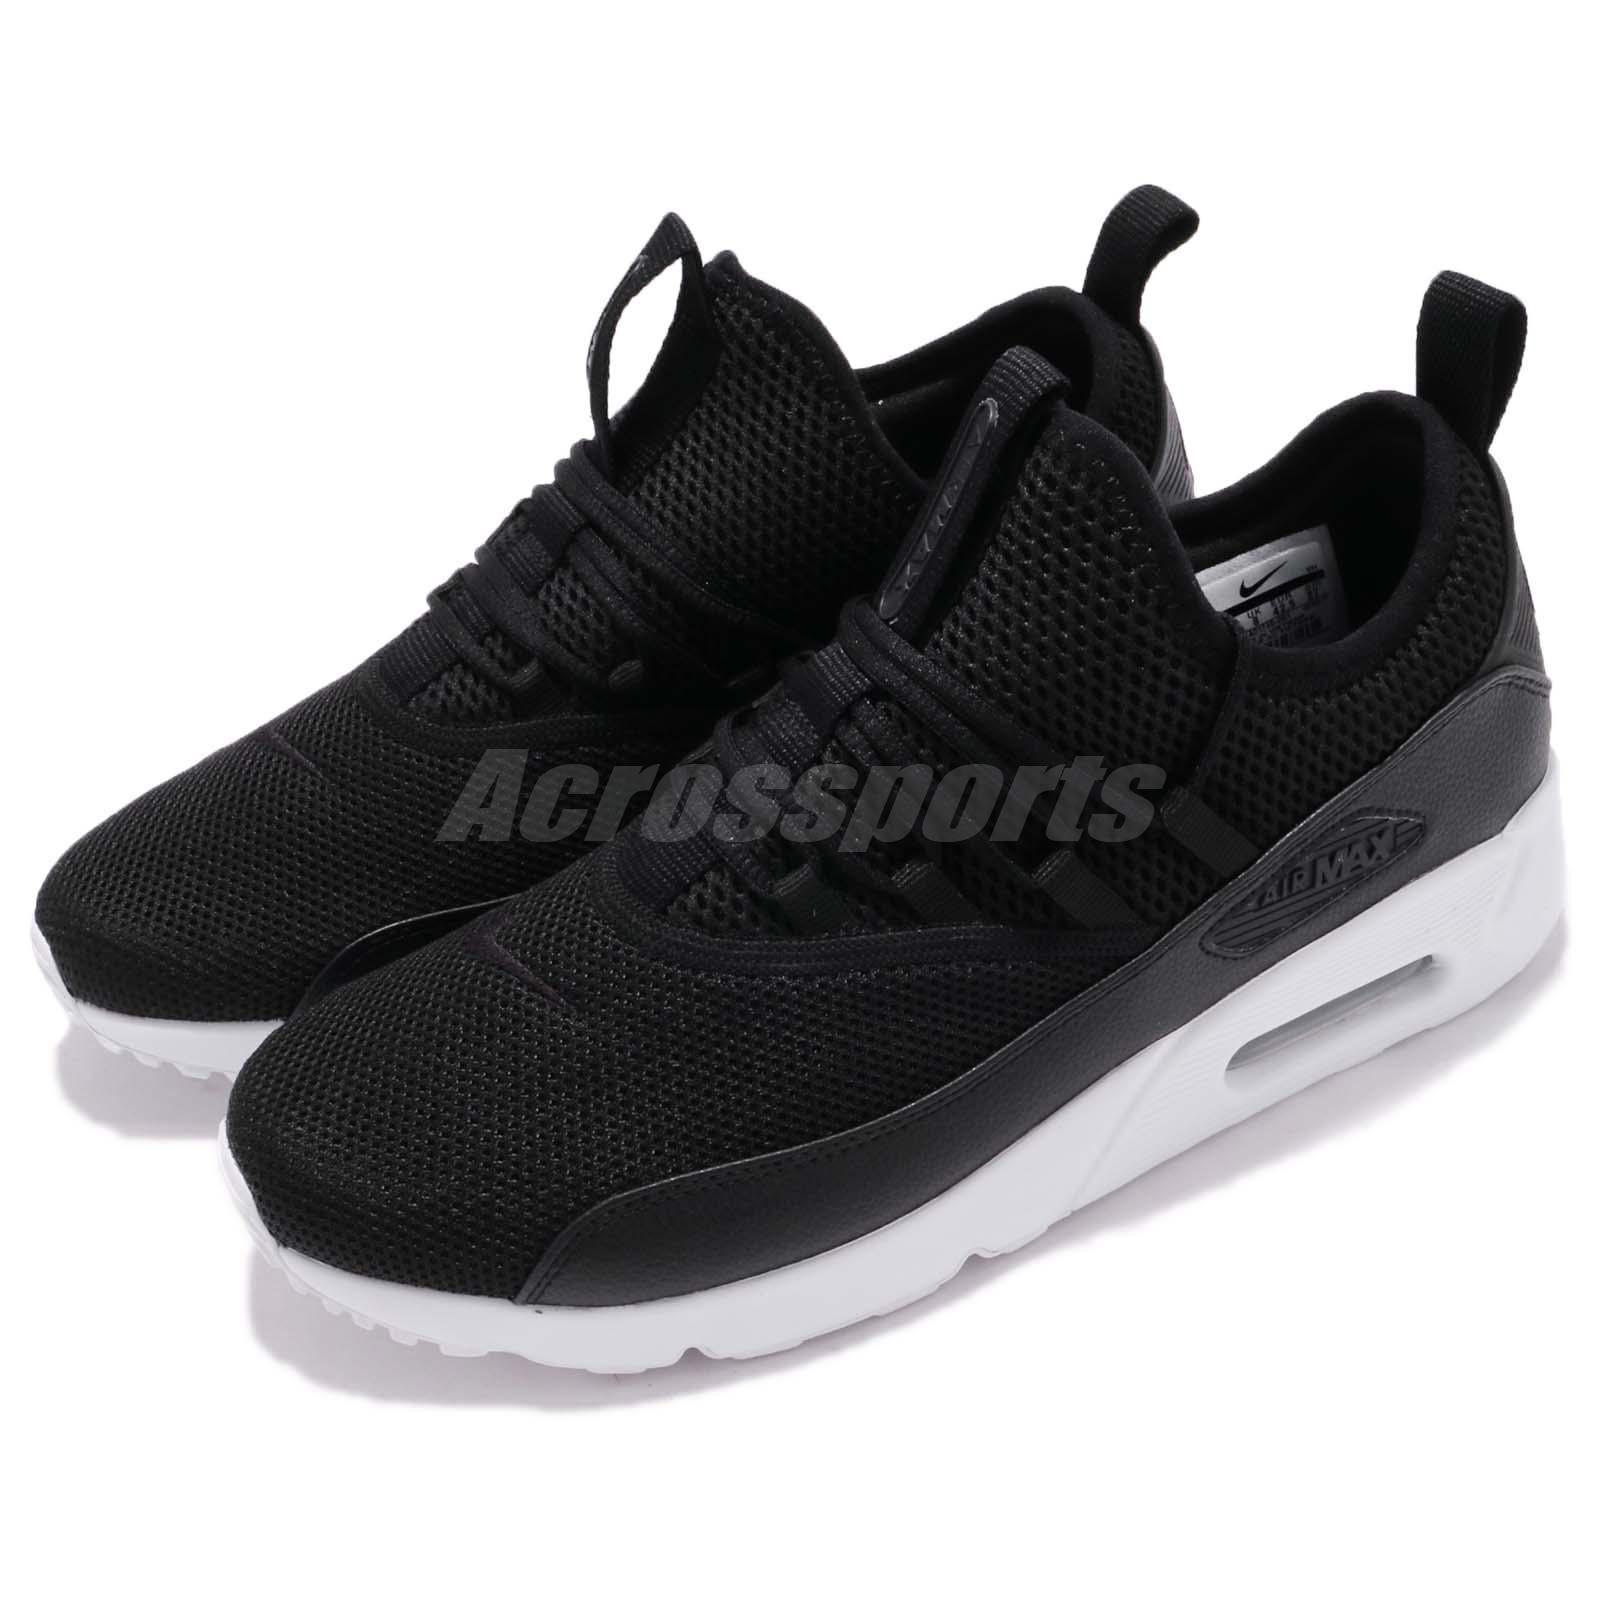 timeless design 9efdc 952b6 Details about Nike Air Max 90 EZ Black White Slip On Men Running Shoes  Sneakers AO1745-001